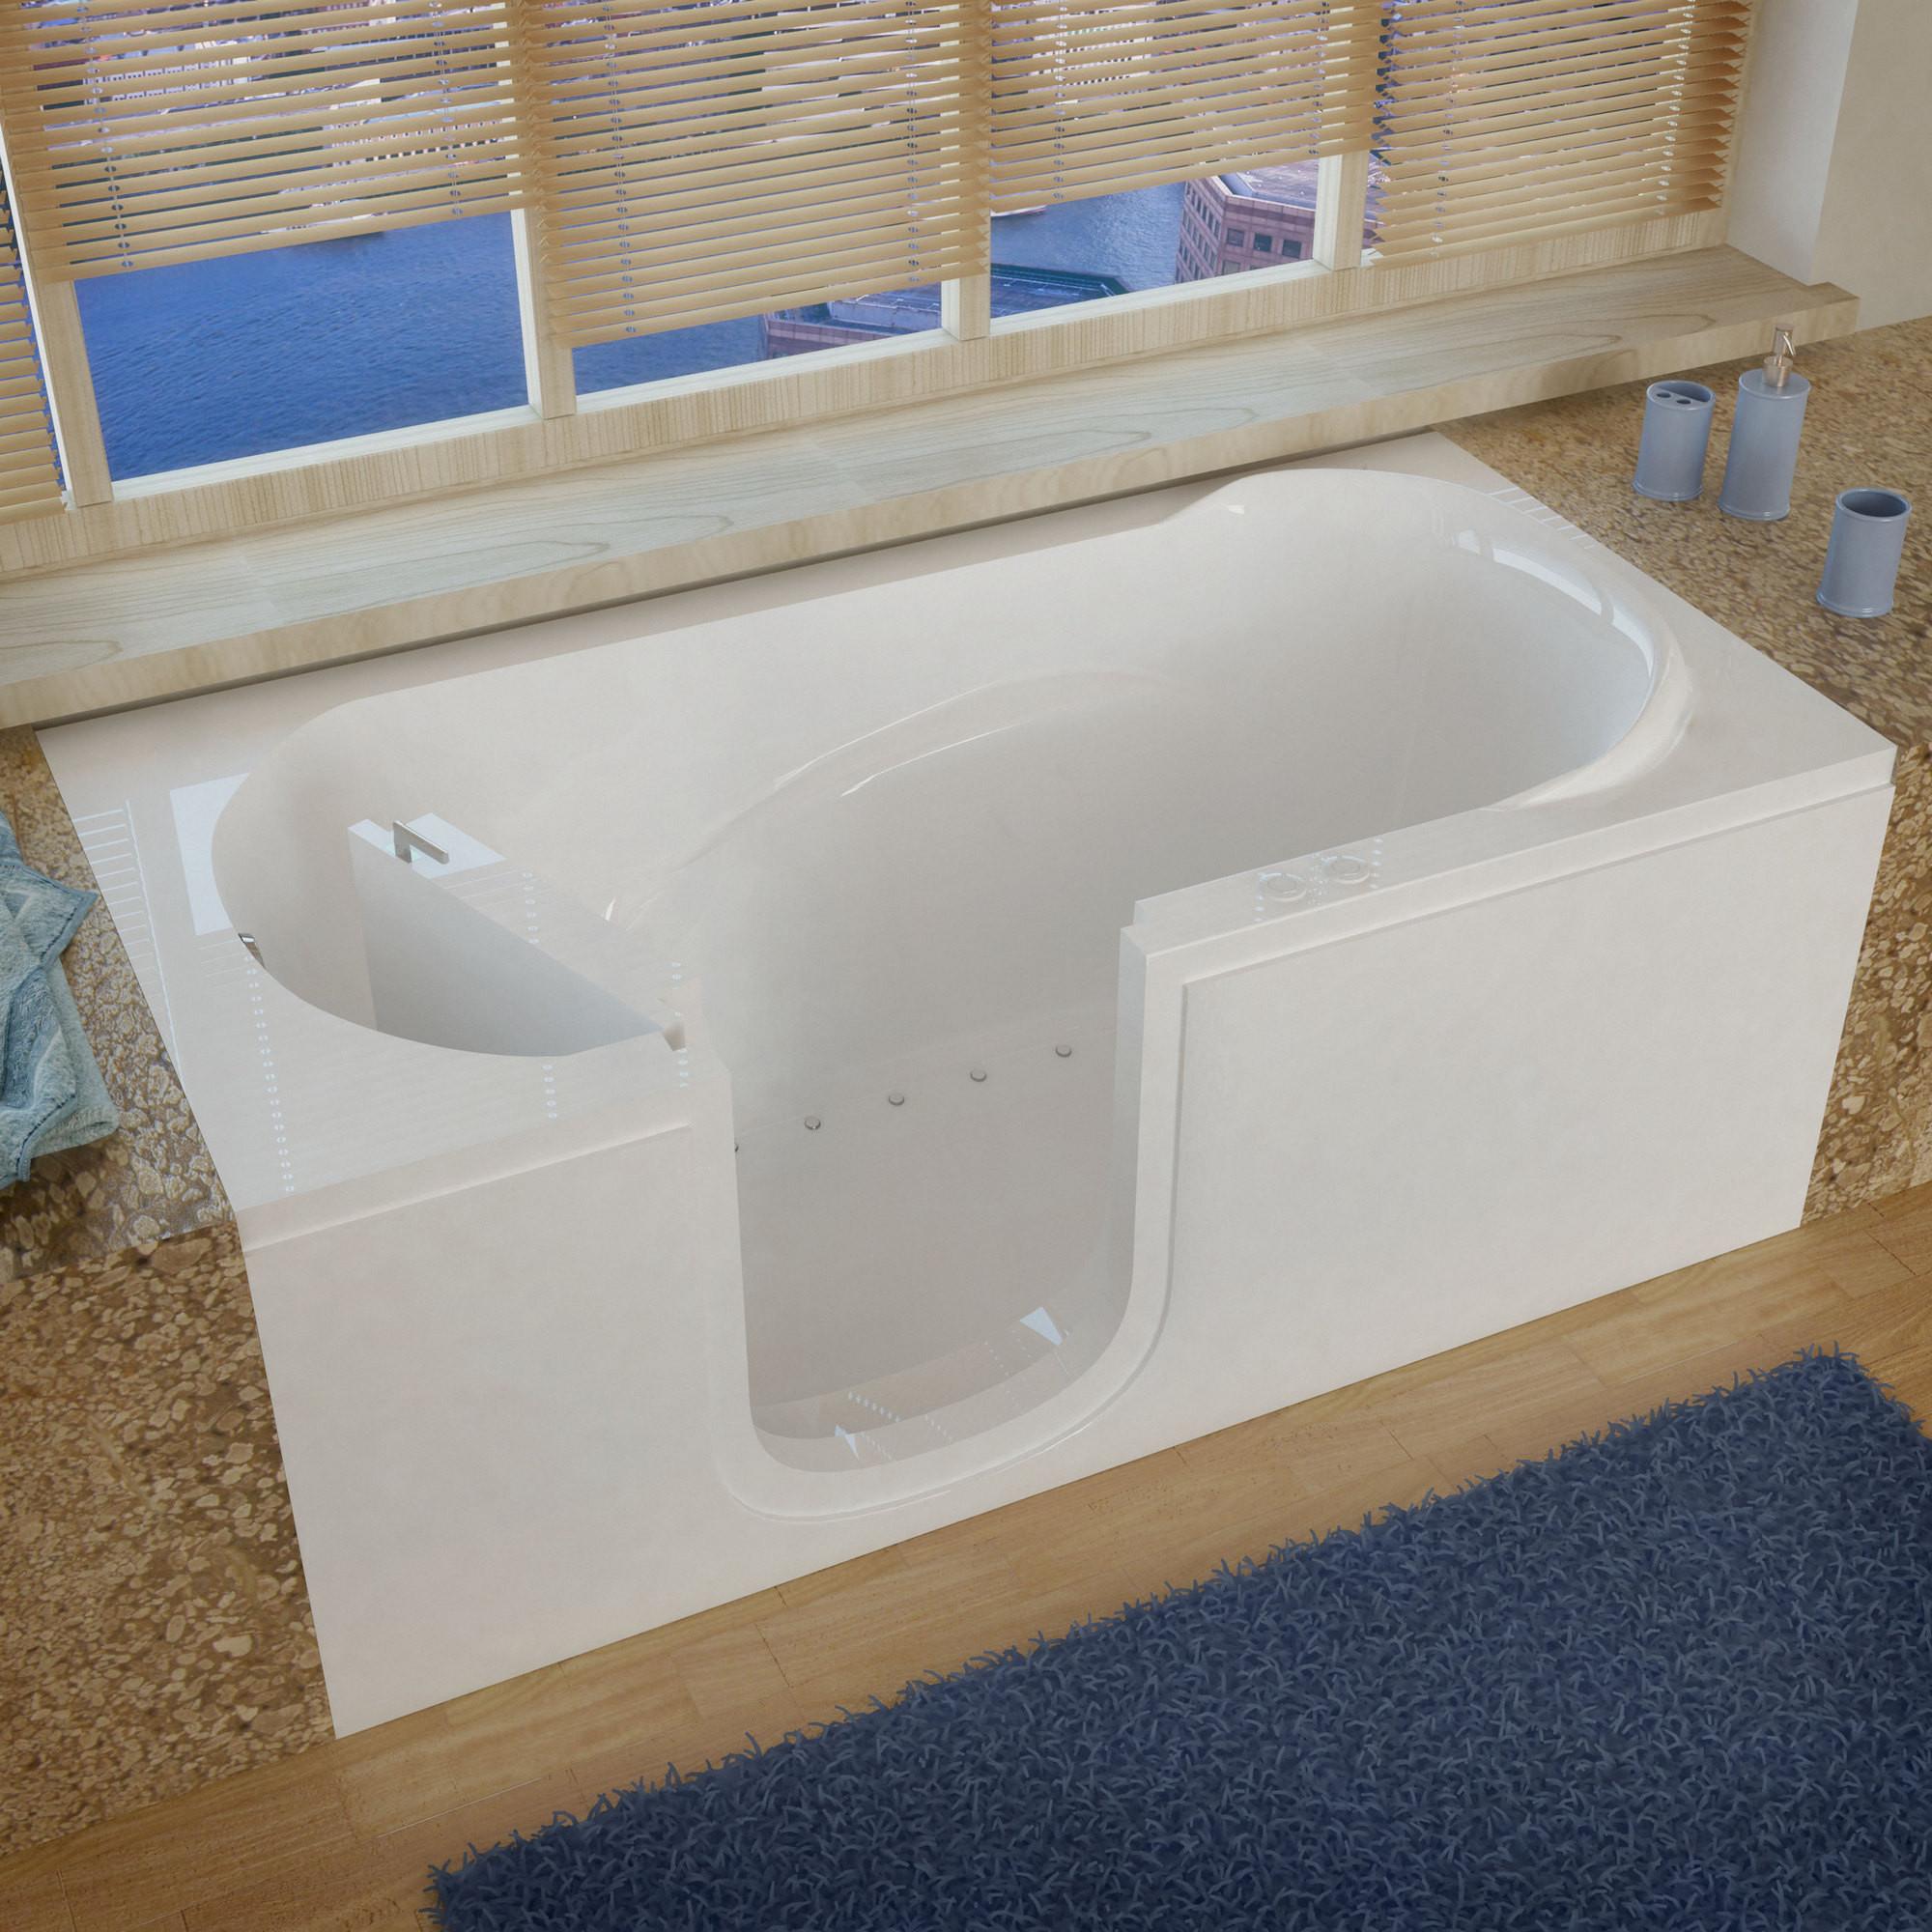 MediTub 3060SILWA Step-In 30x60 Left Drain White Air Jetted Step-In Bathtub